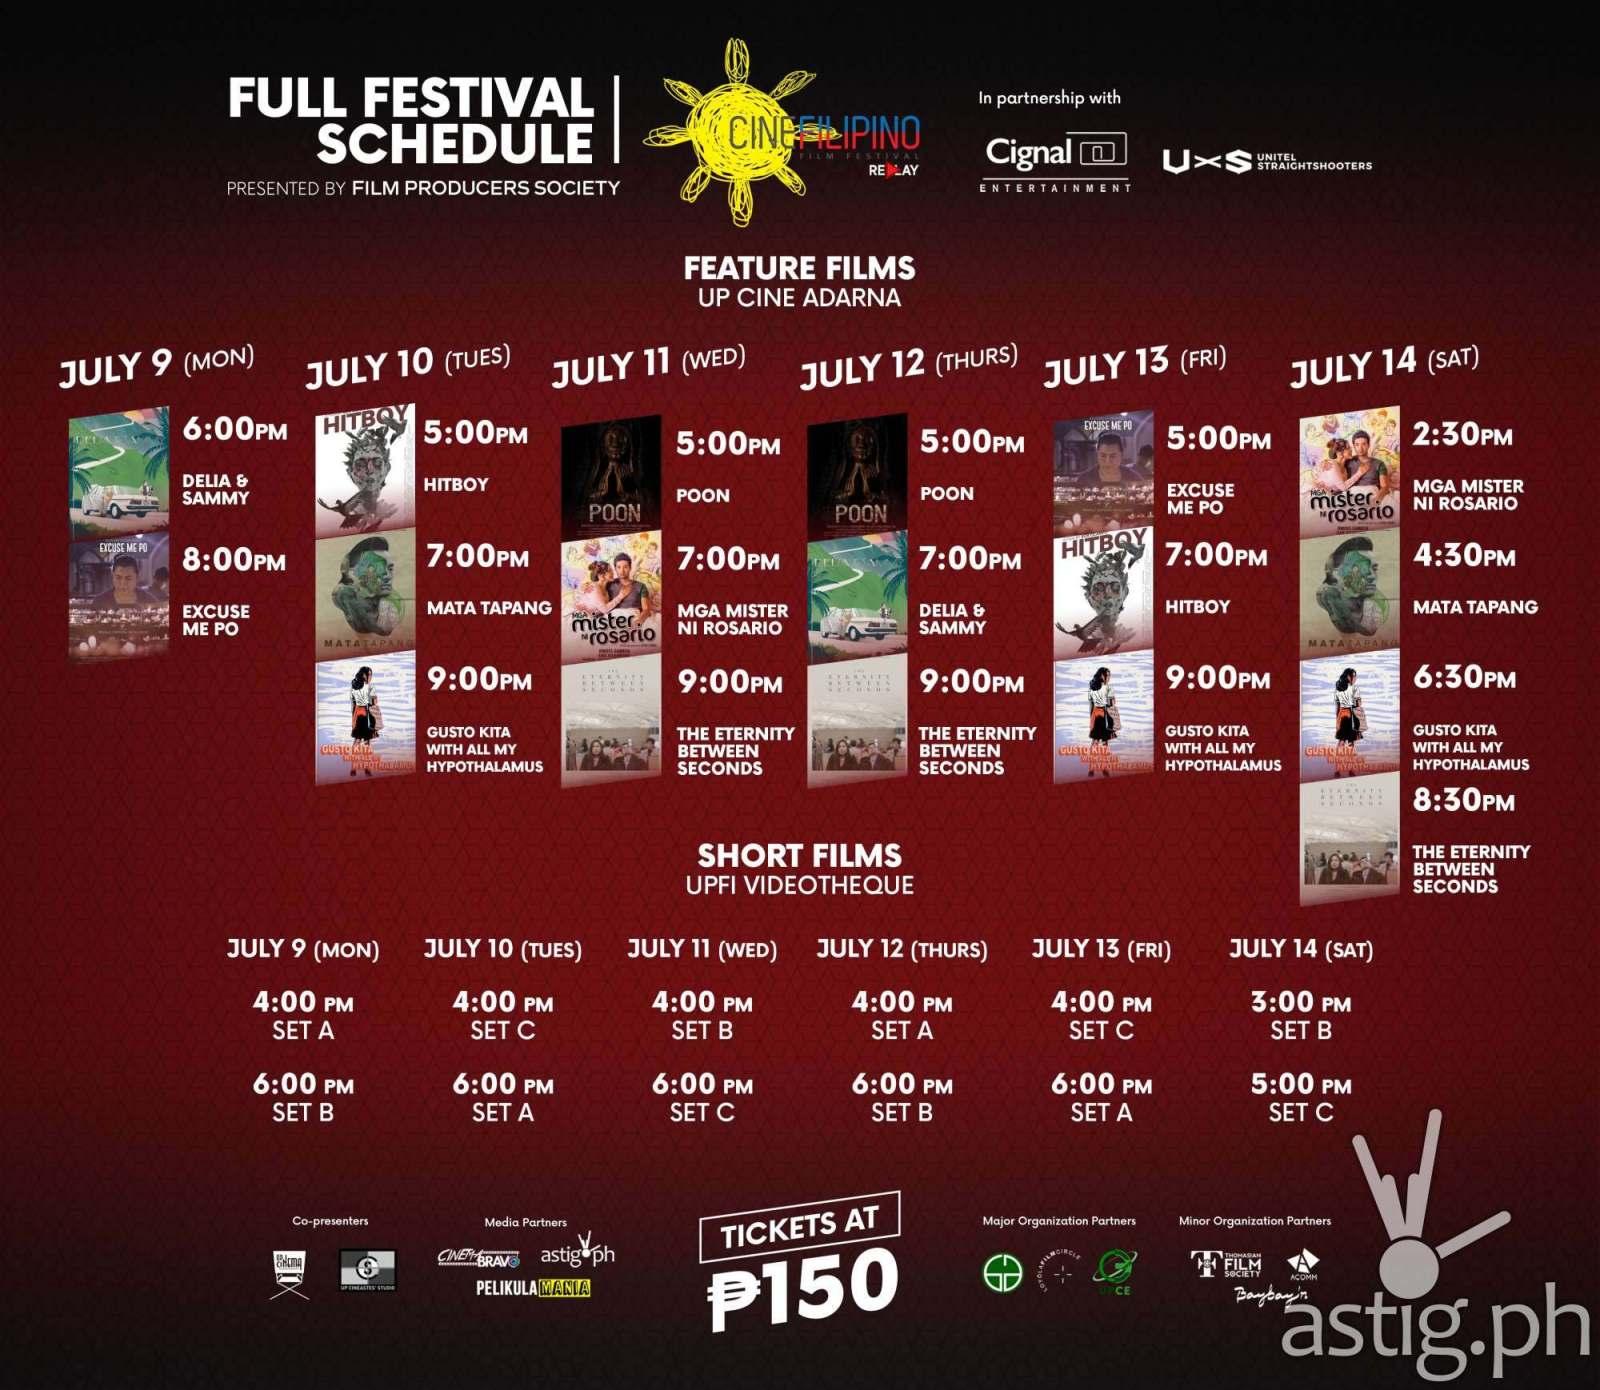 CineFilipino Replay Full Festival Schedule